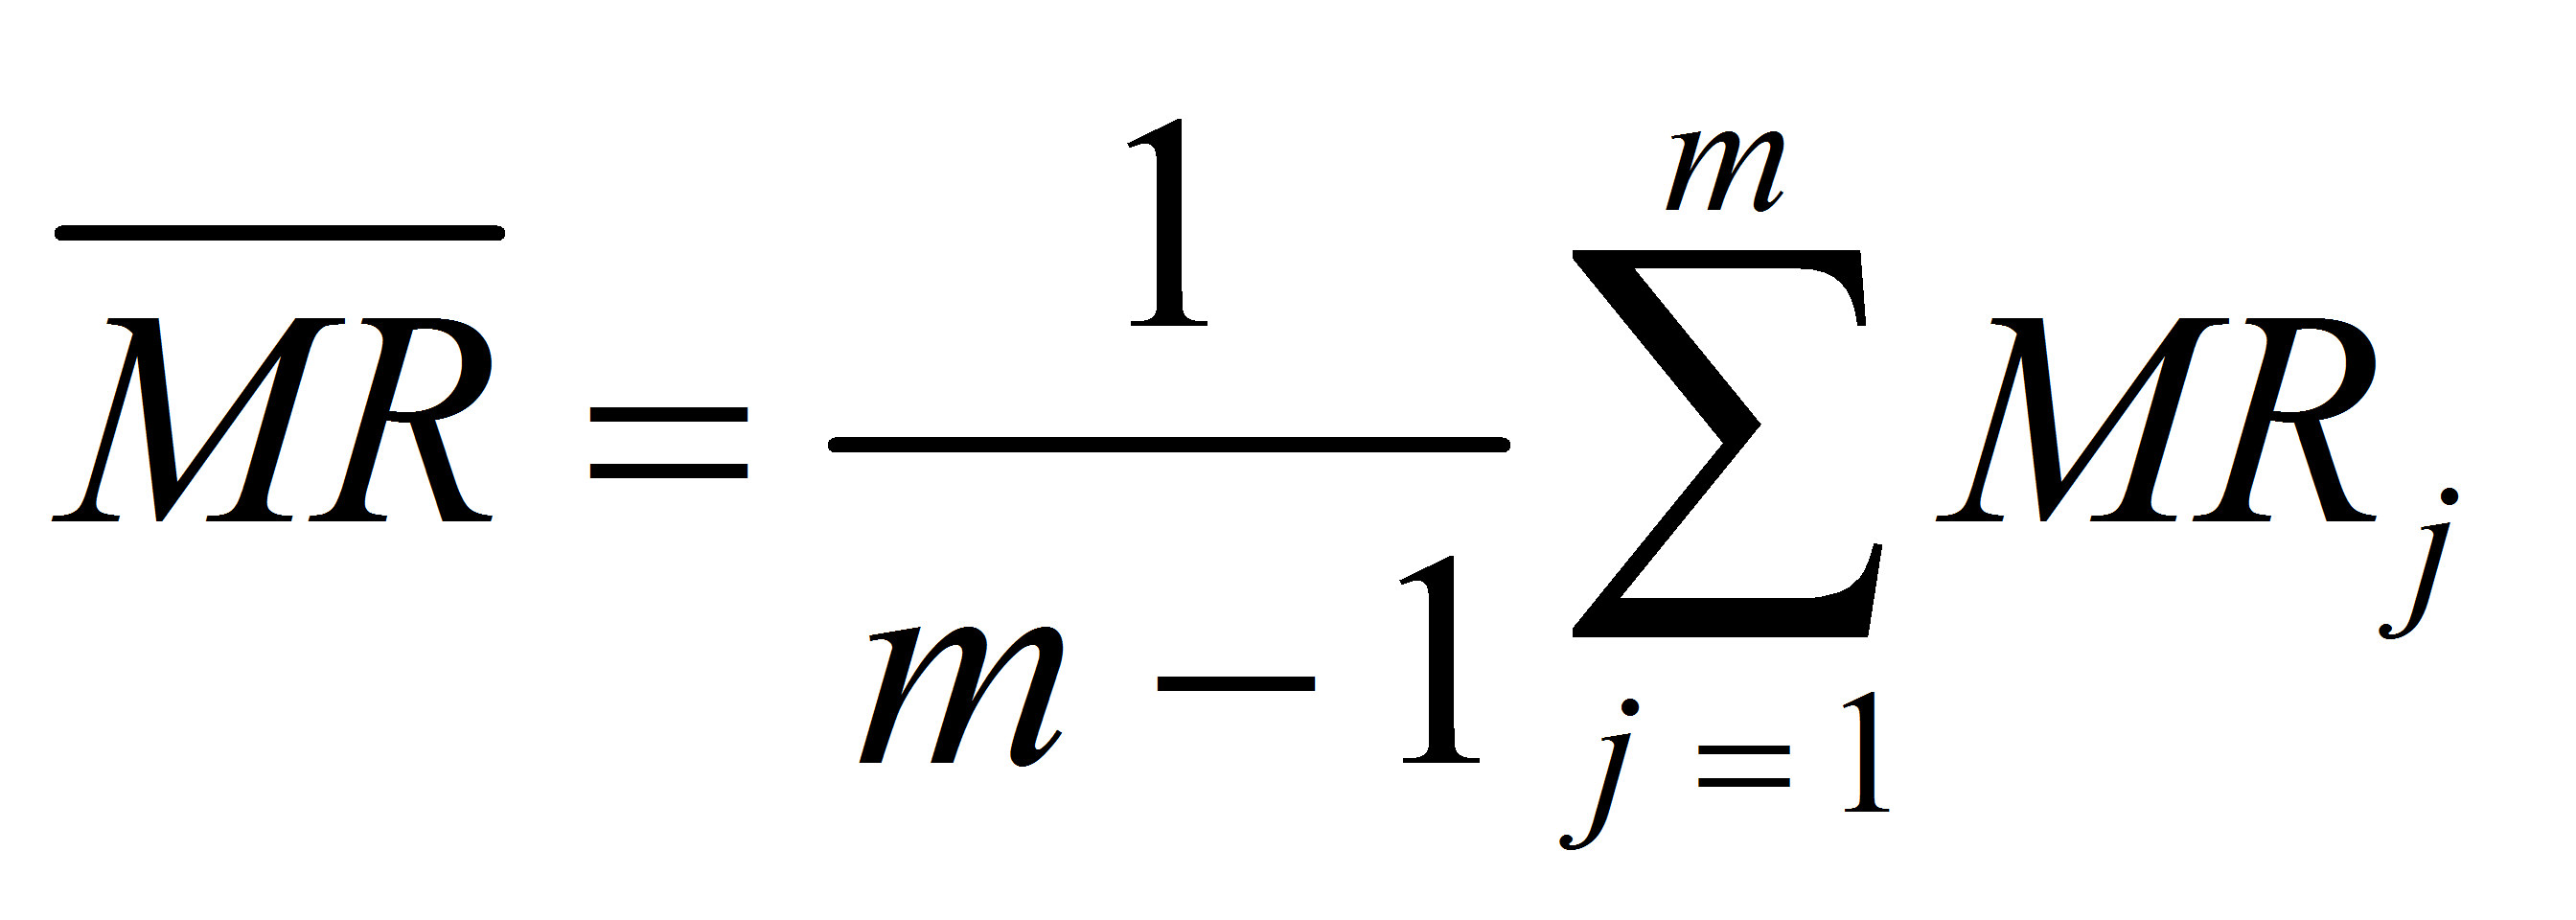 Moving Range Chart Calculations